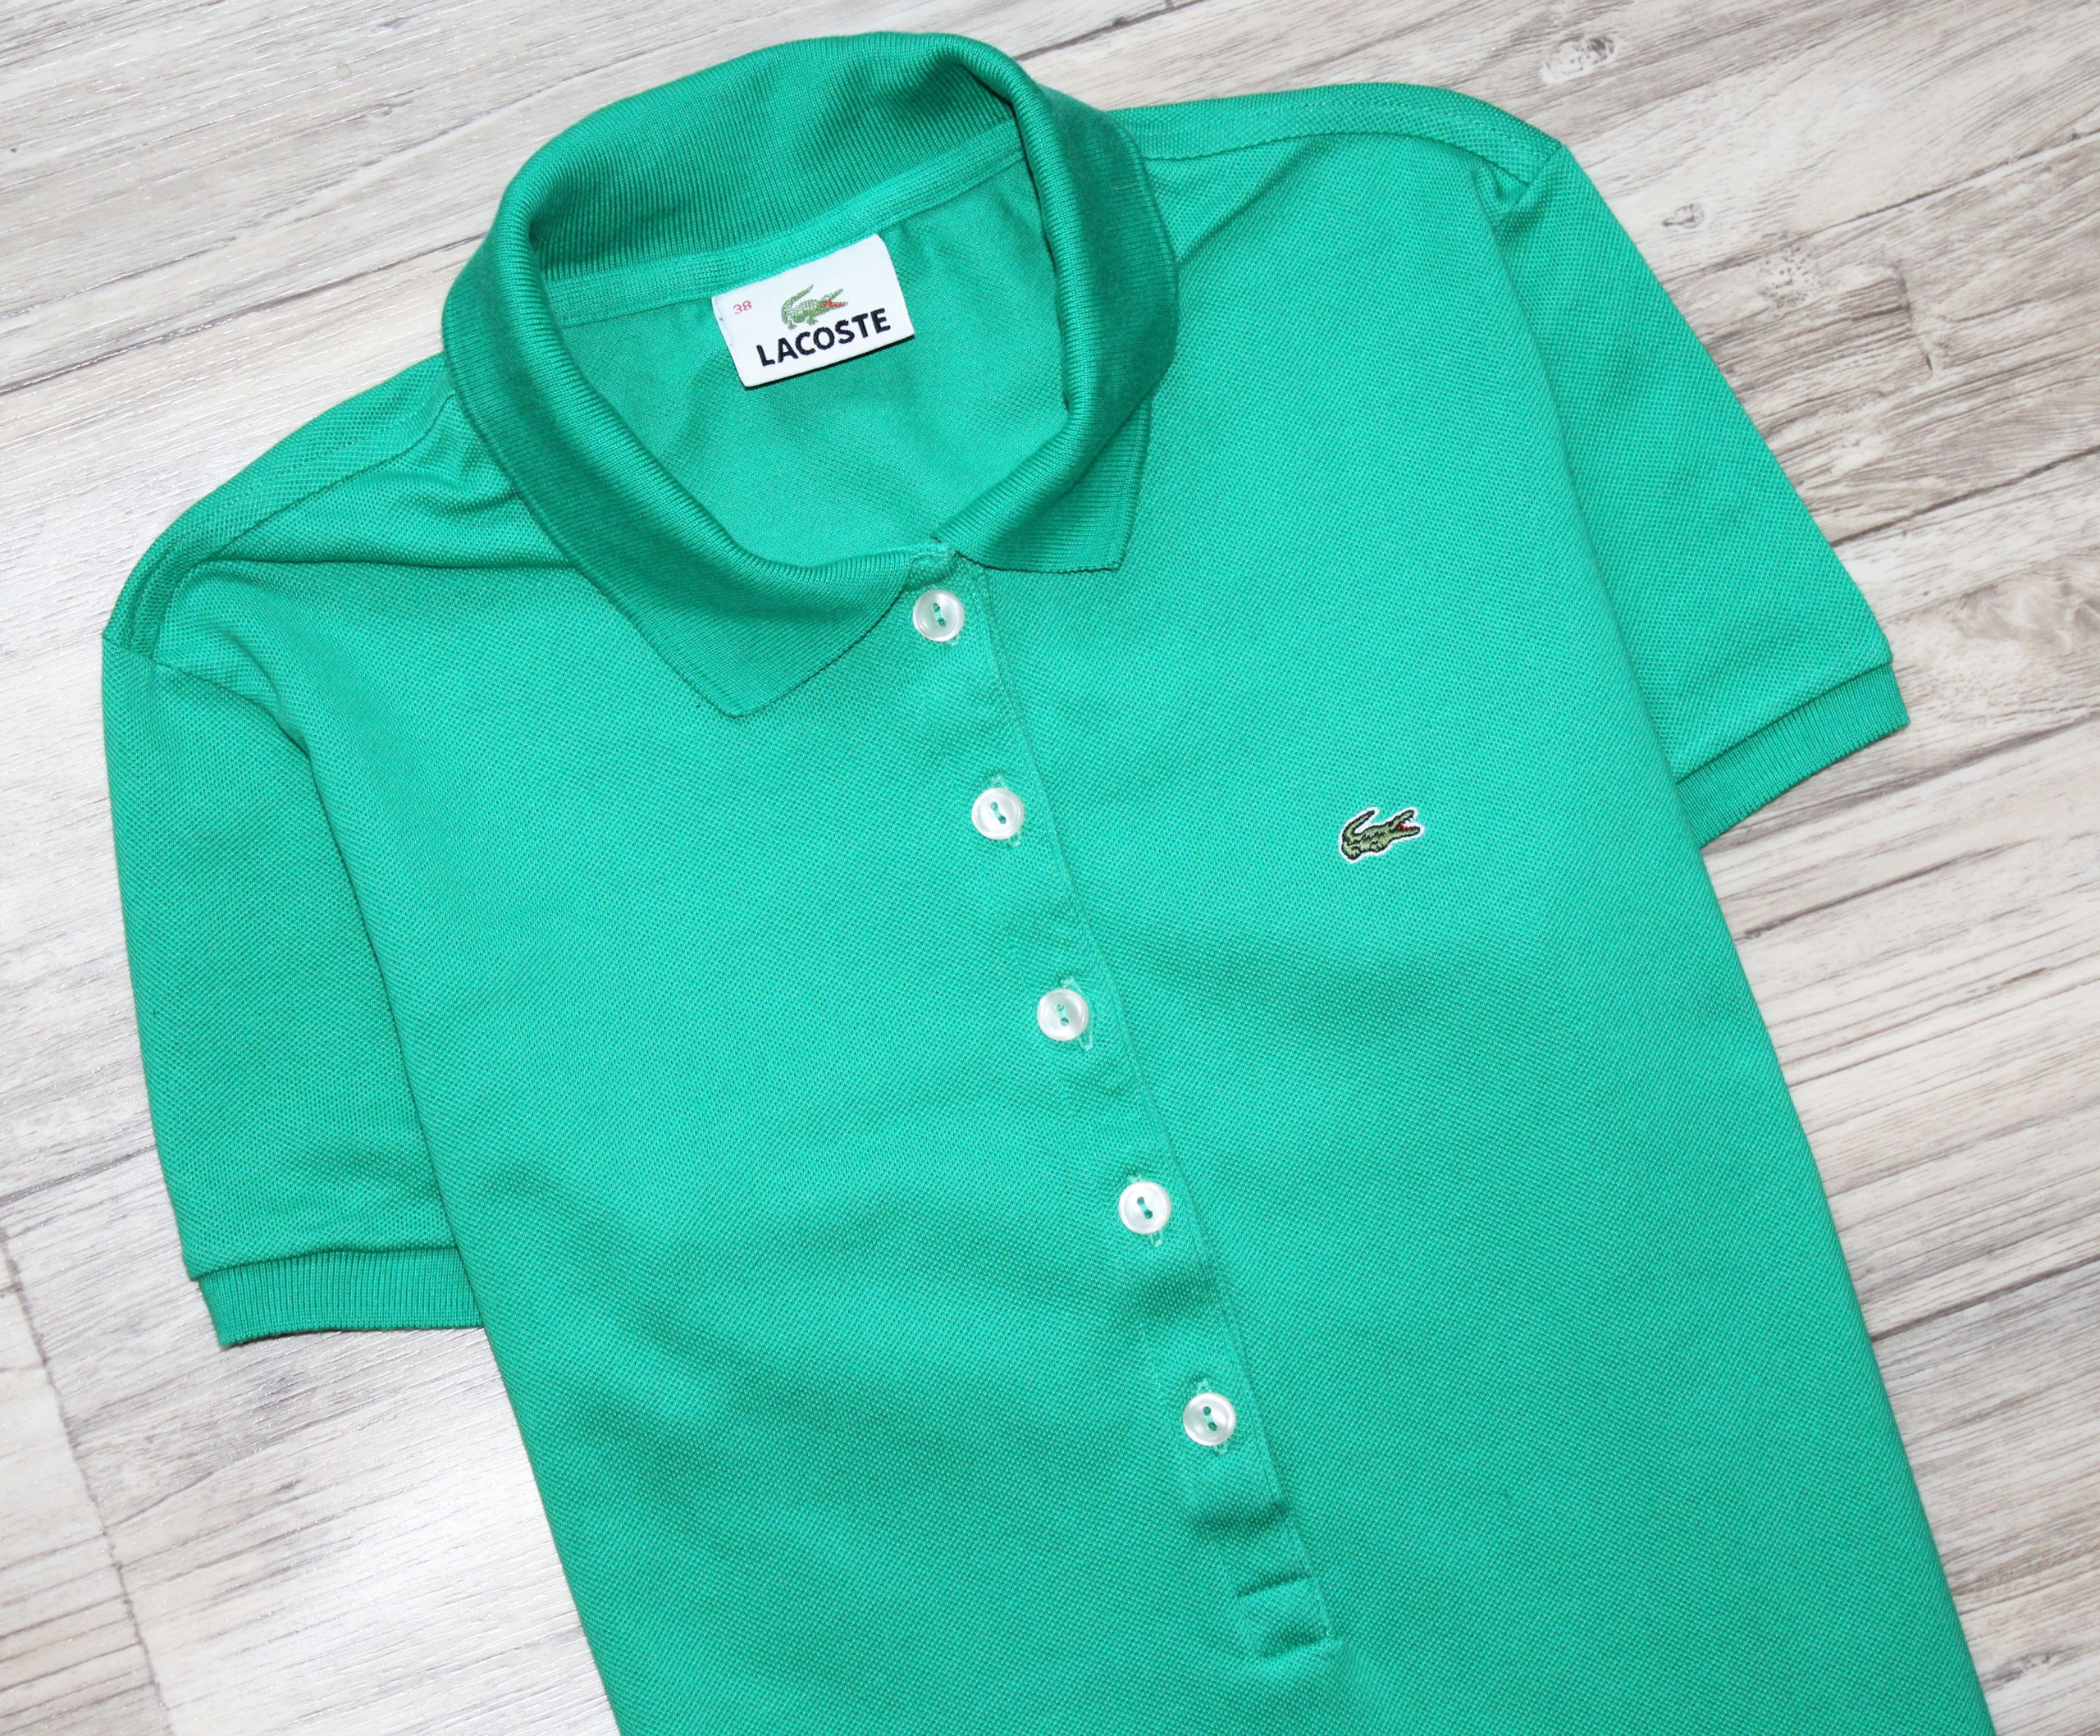 d86849e52 Bluzka Polo Lacoste bdb 38 S oryginał logo - 7460505216 - oficjalne ...